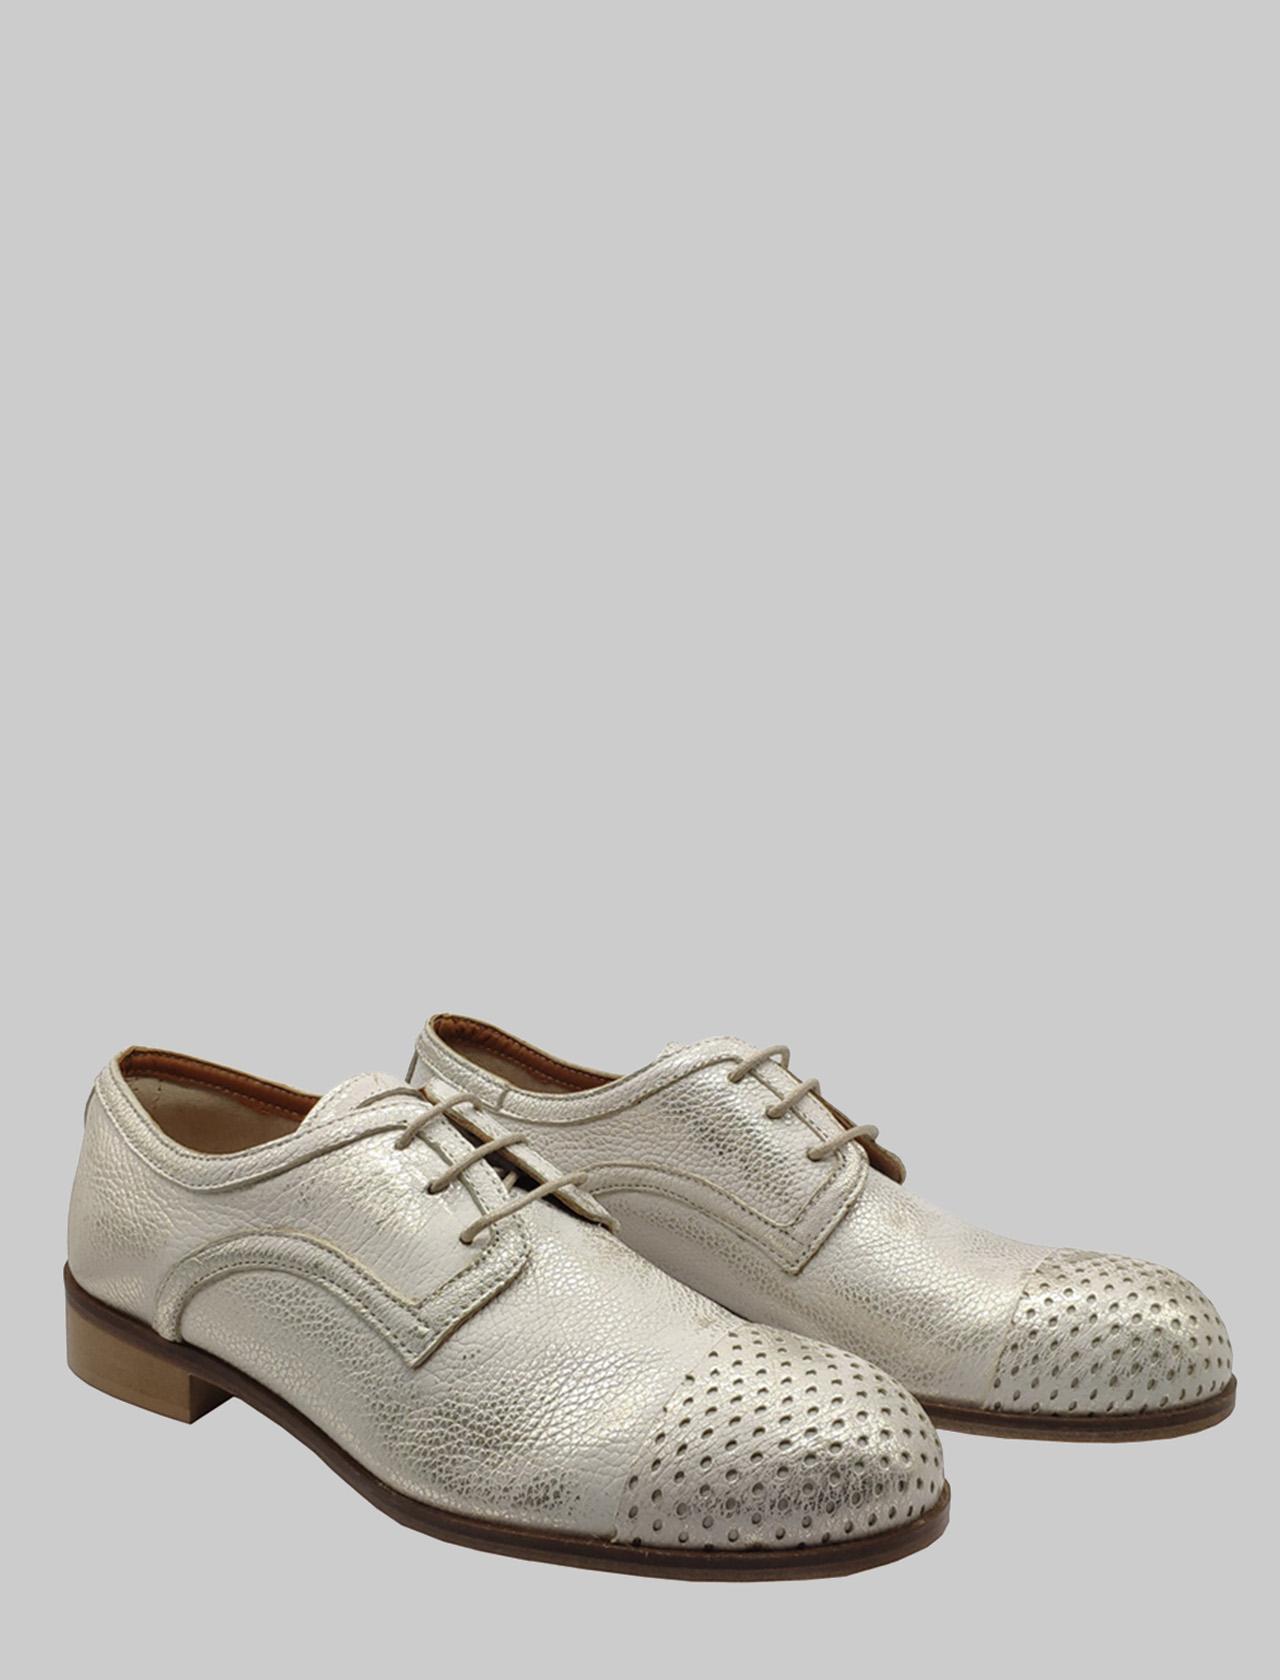 Spatarella | Lace up shoes | 1806PLATINO